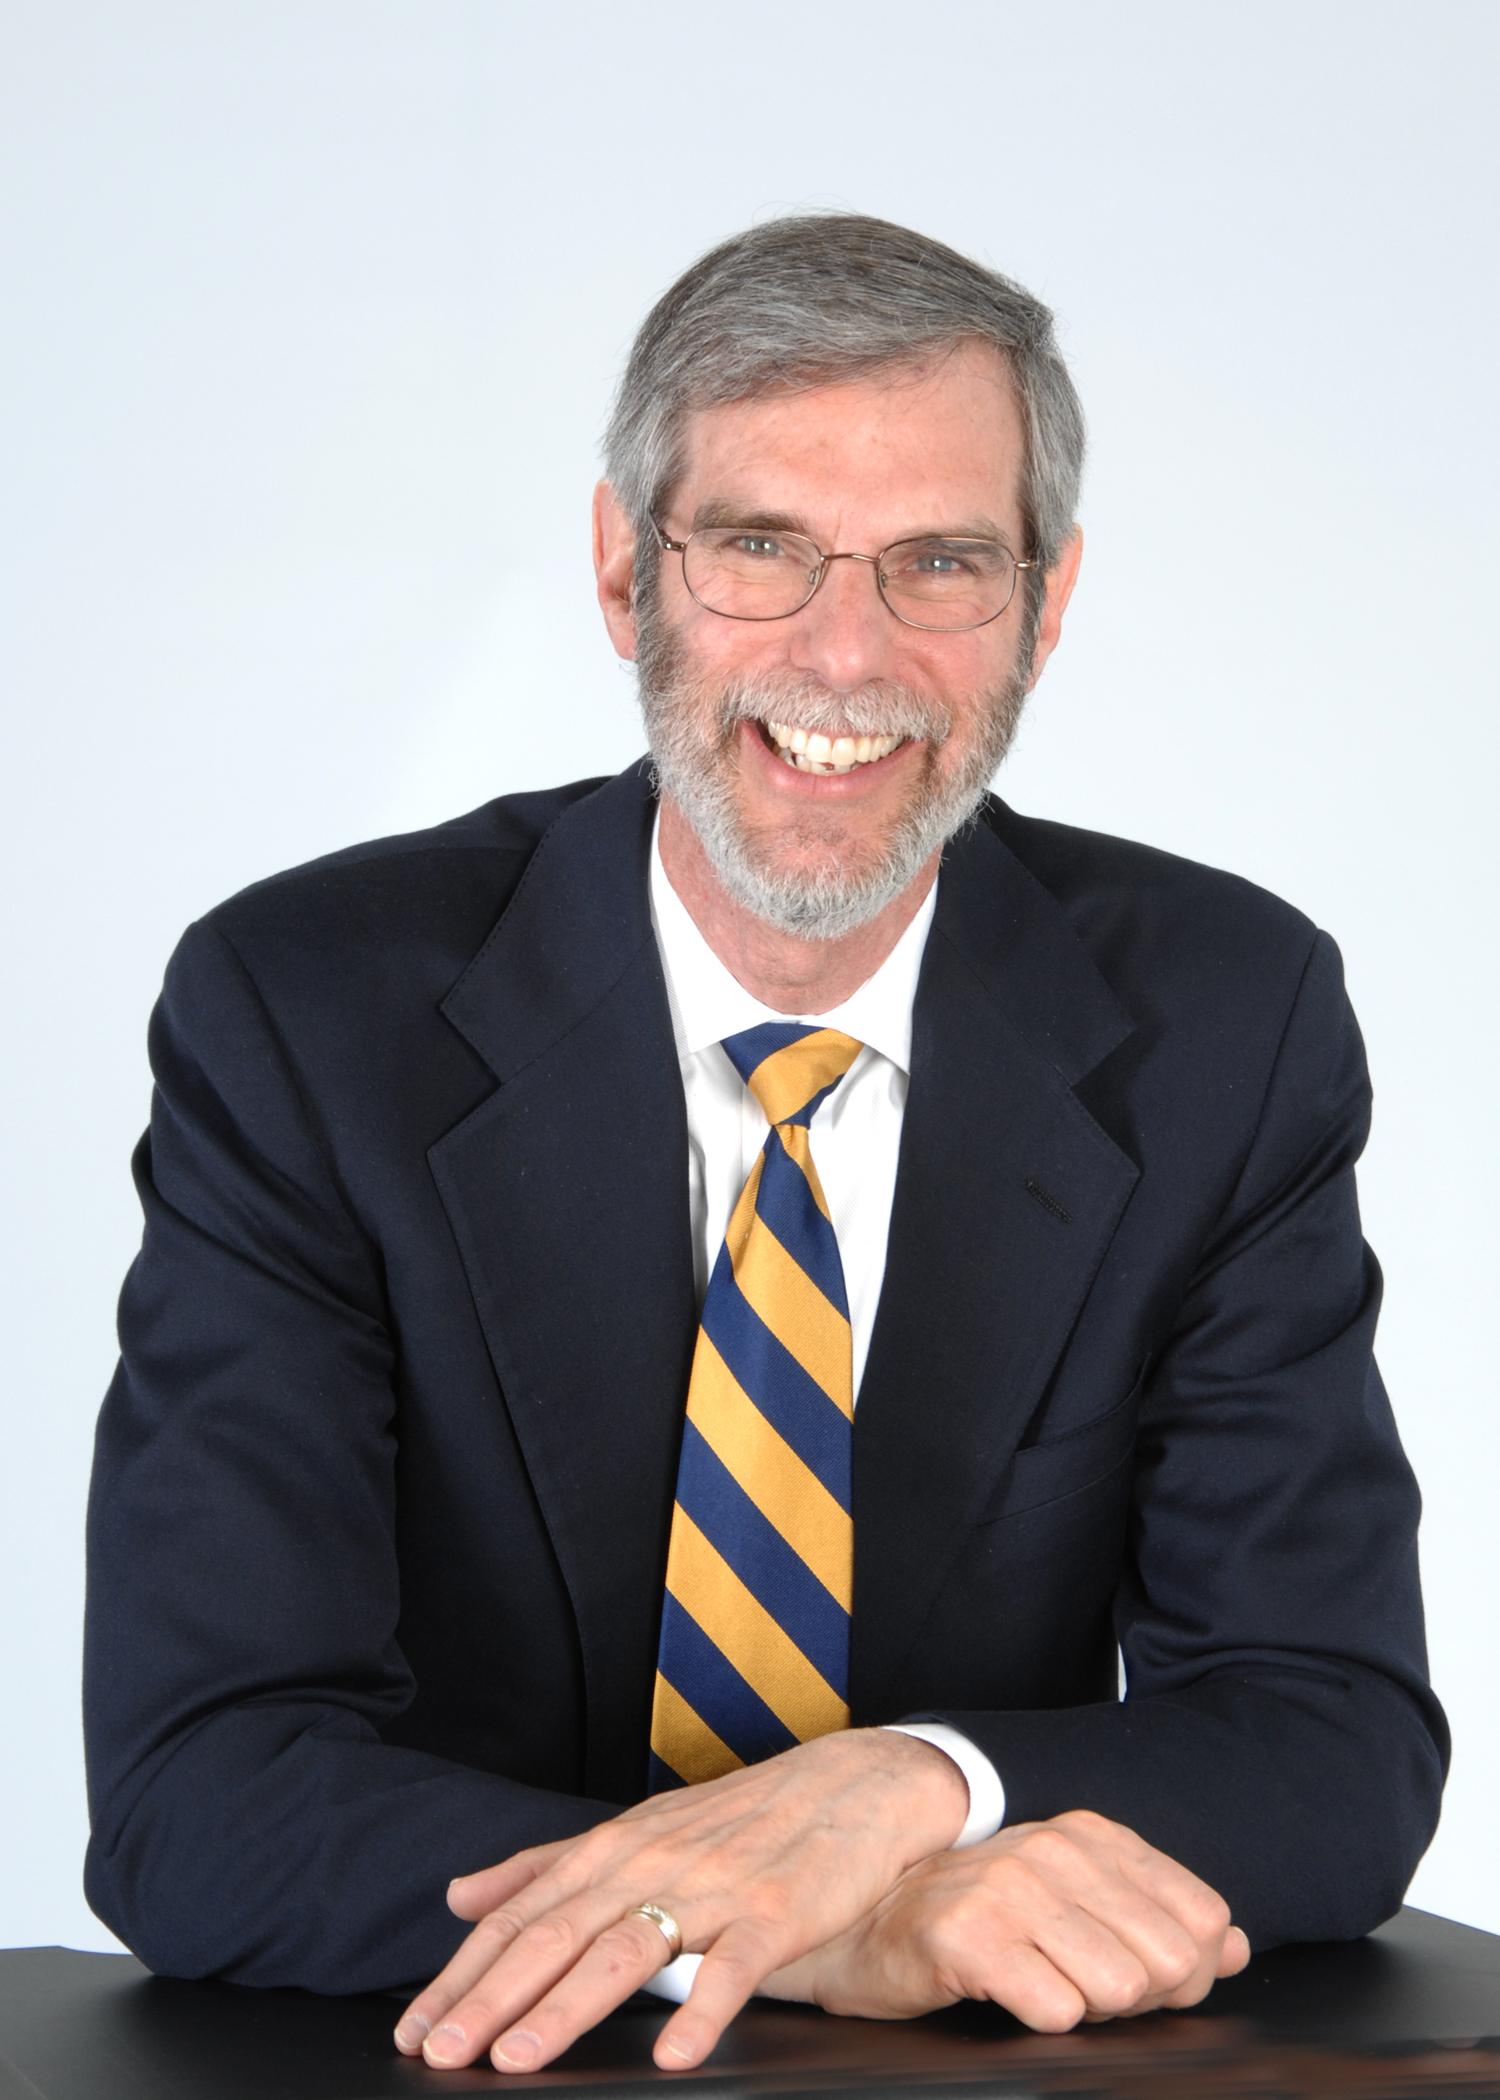 alan goldman Alan p goldman npi profile information alan goldman, 207rr0500x - rheumatology doctors & physicians in brooklyn, ny.